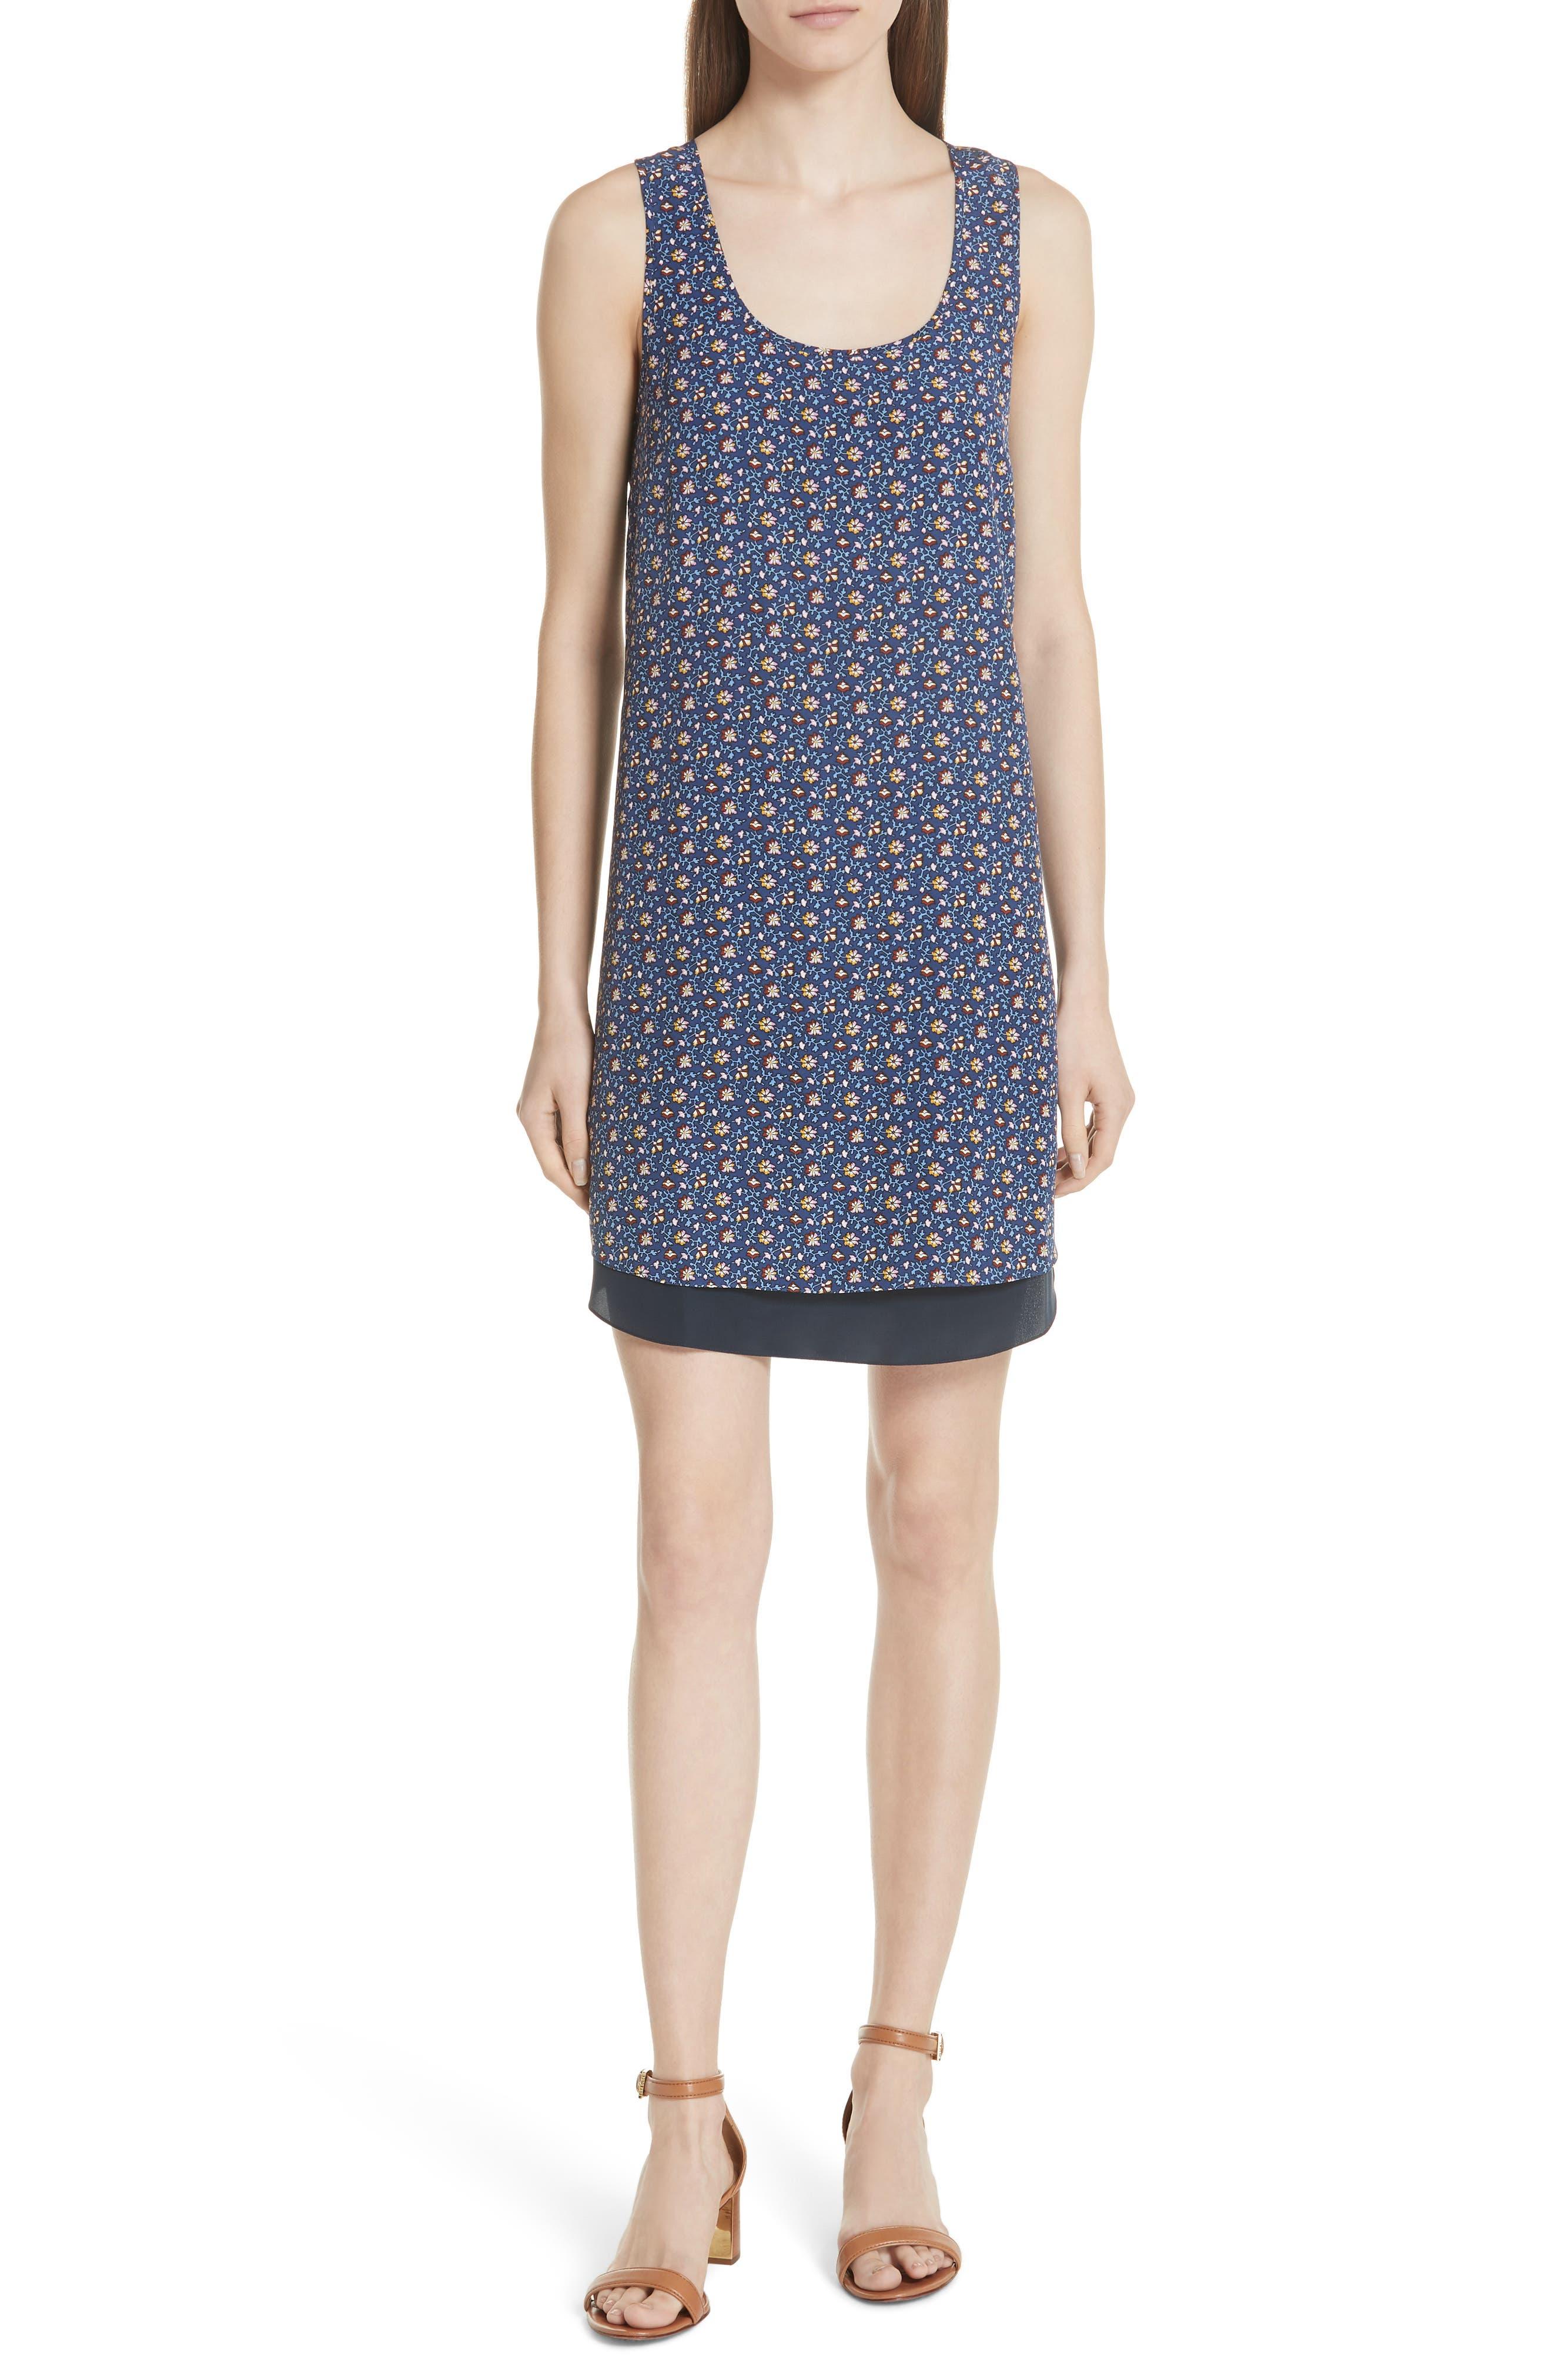 Sydney Sleeveless Silk Dress,                         Main,                         color, Blue Wild Pansy